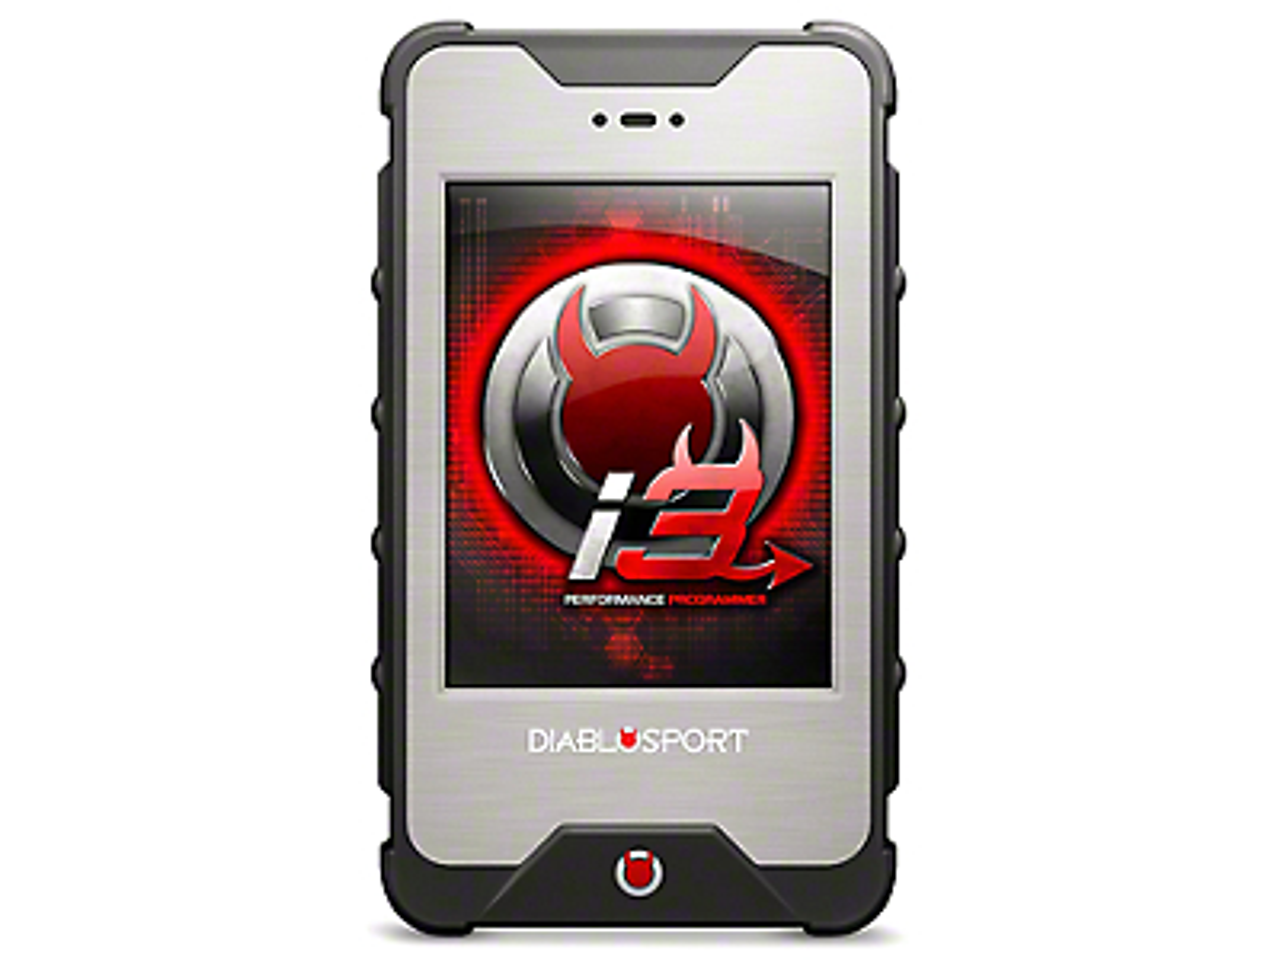 Diablosport inTune i3 Tuner (11-14 6.2L F-150, Excluding Raptor)